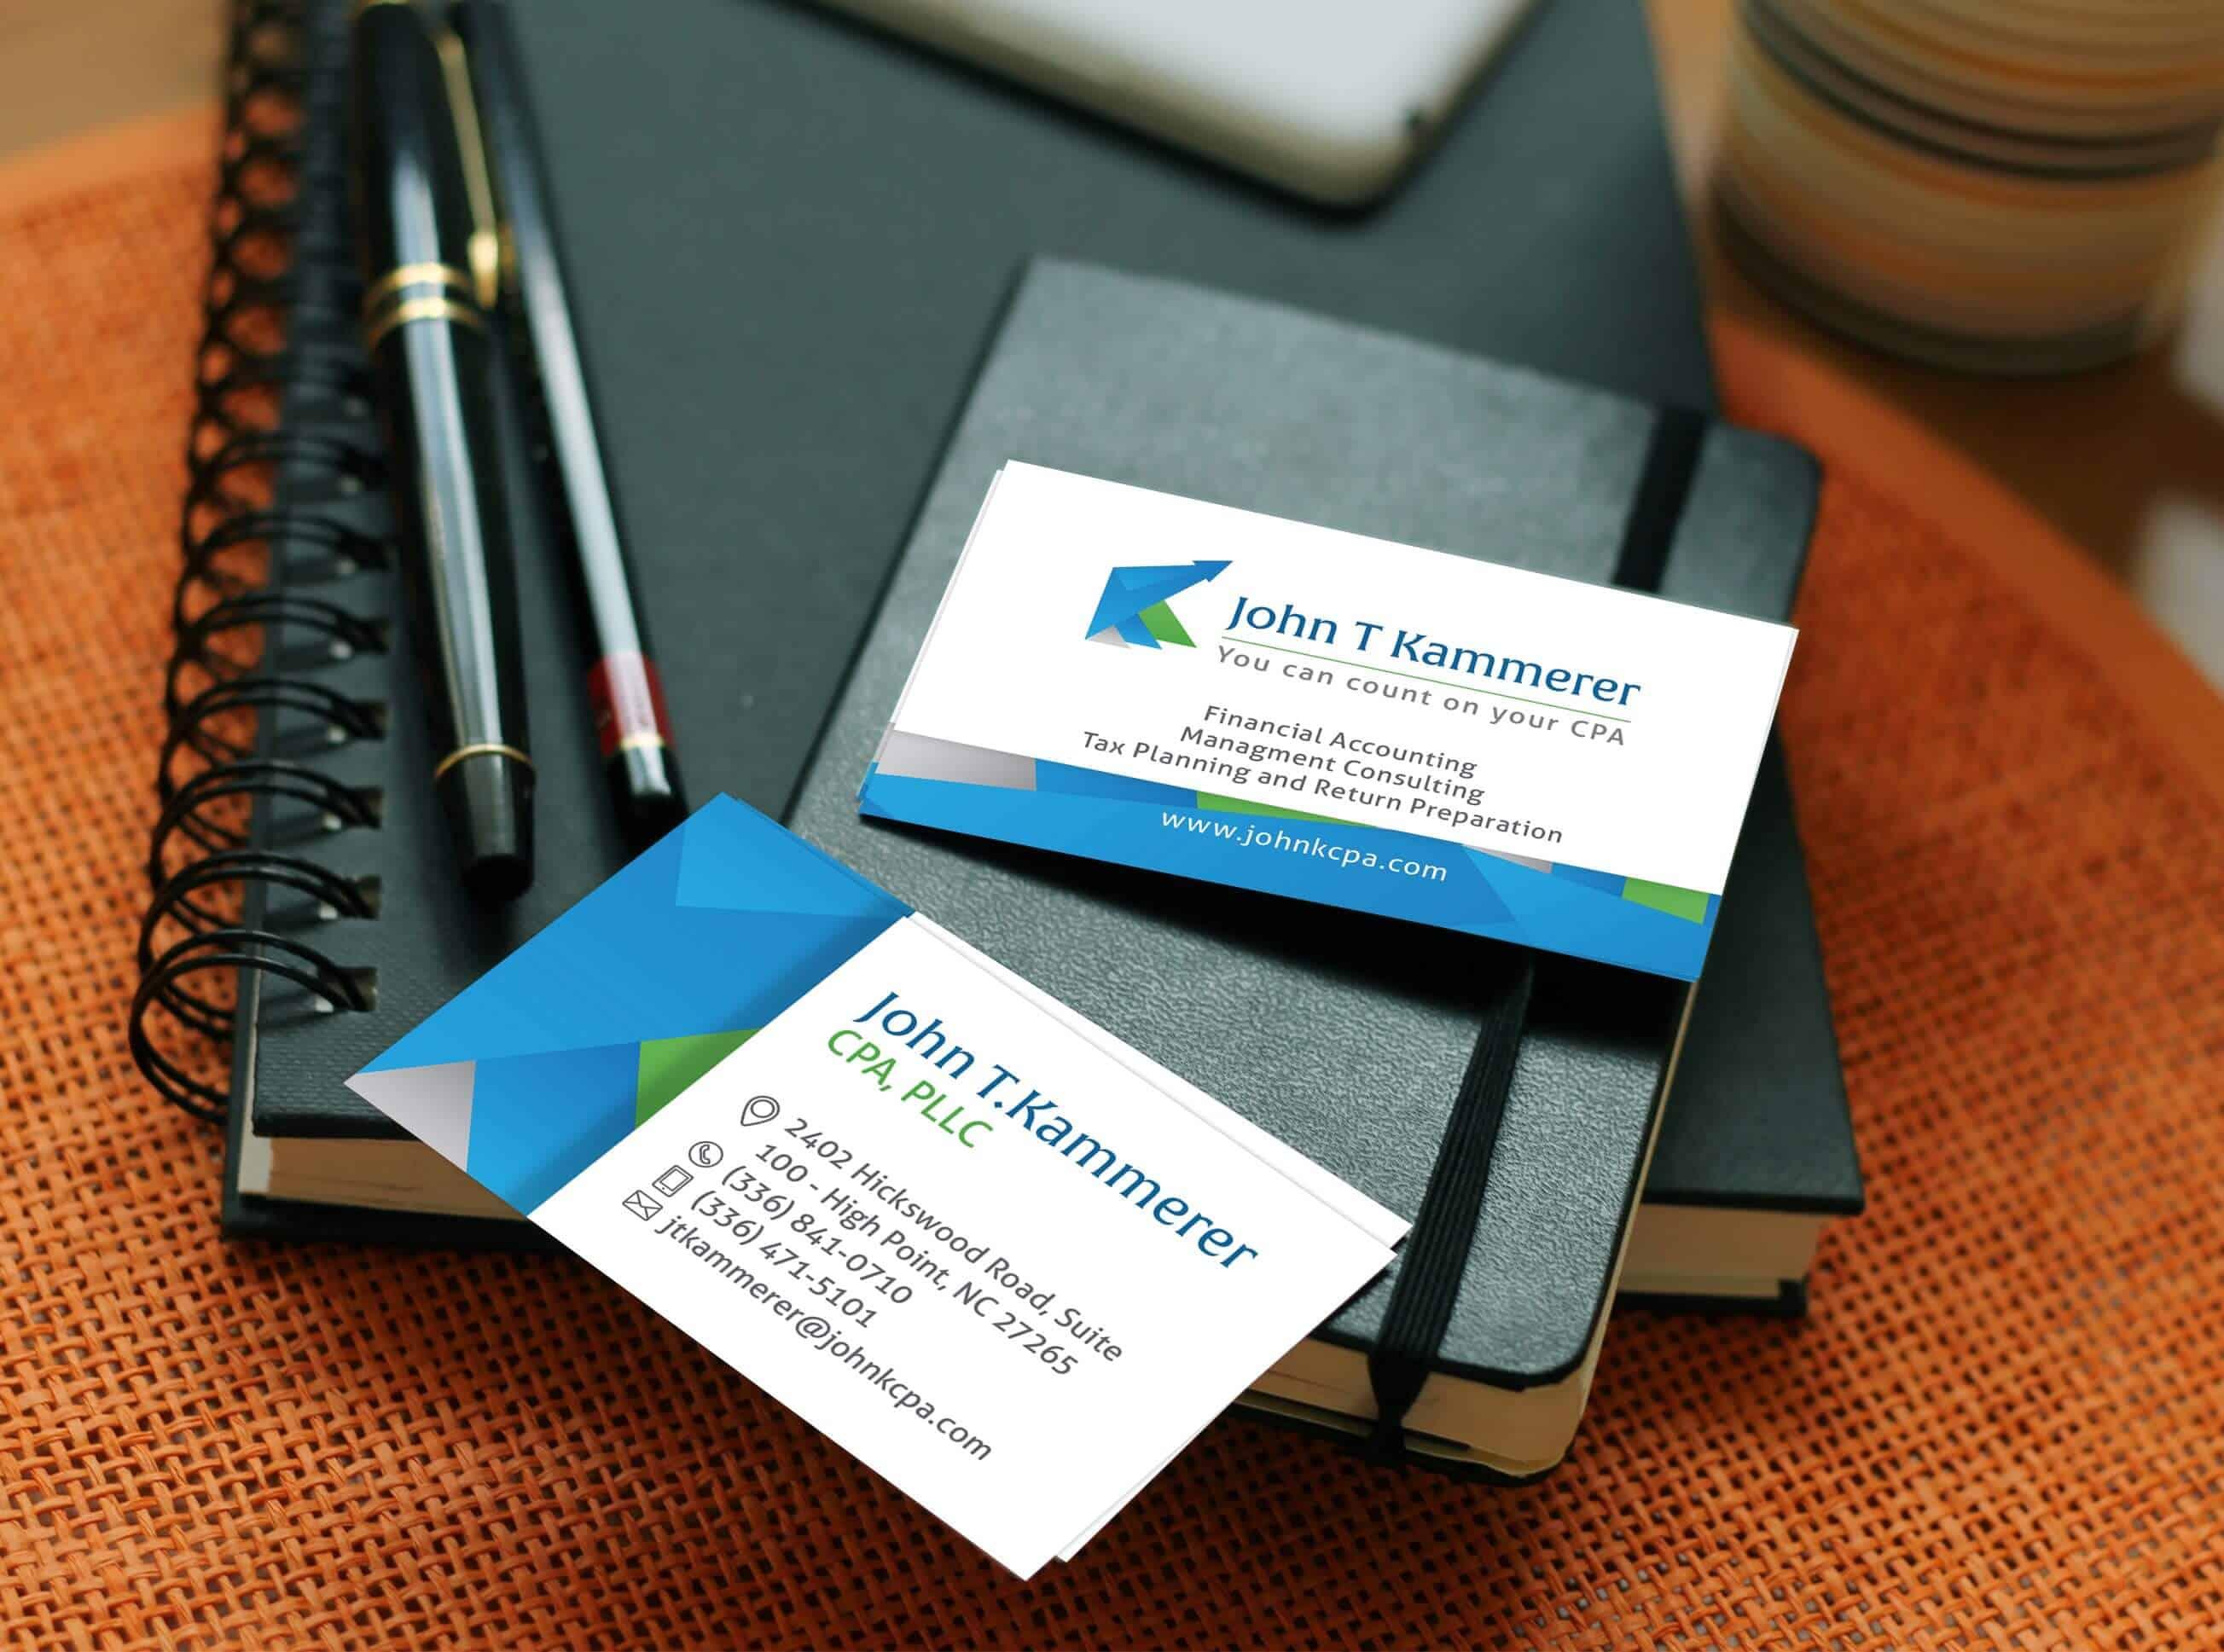 John T Kammerer Accountant - Business Card design - Graphic Design ...